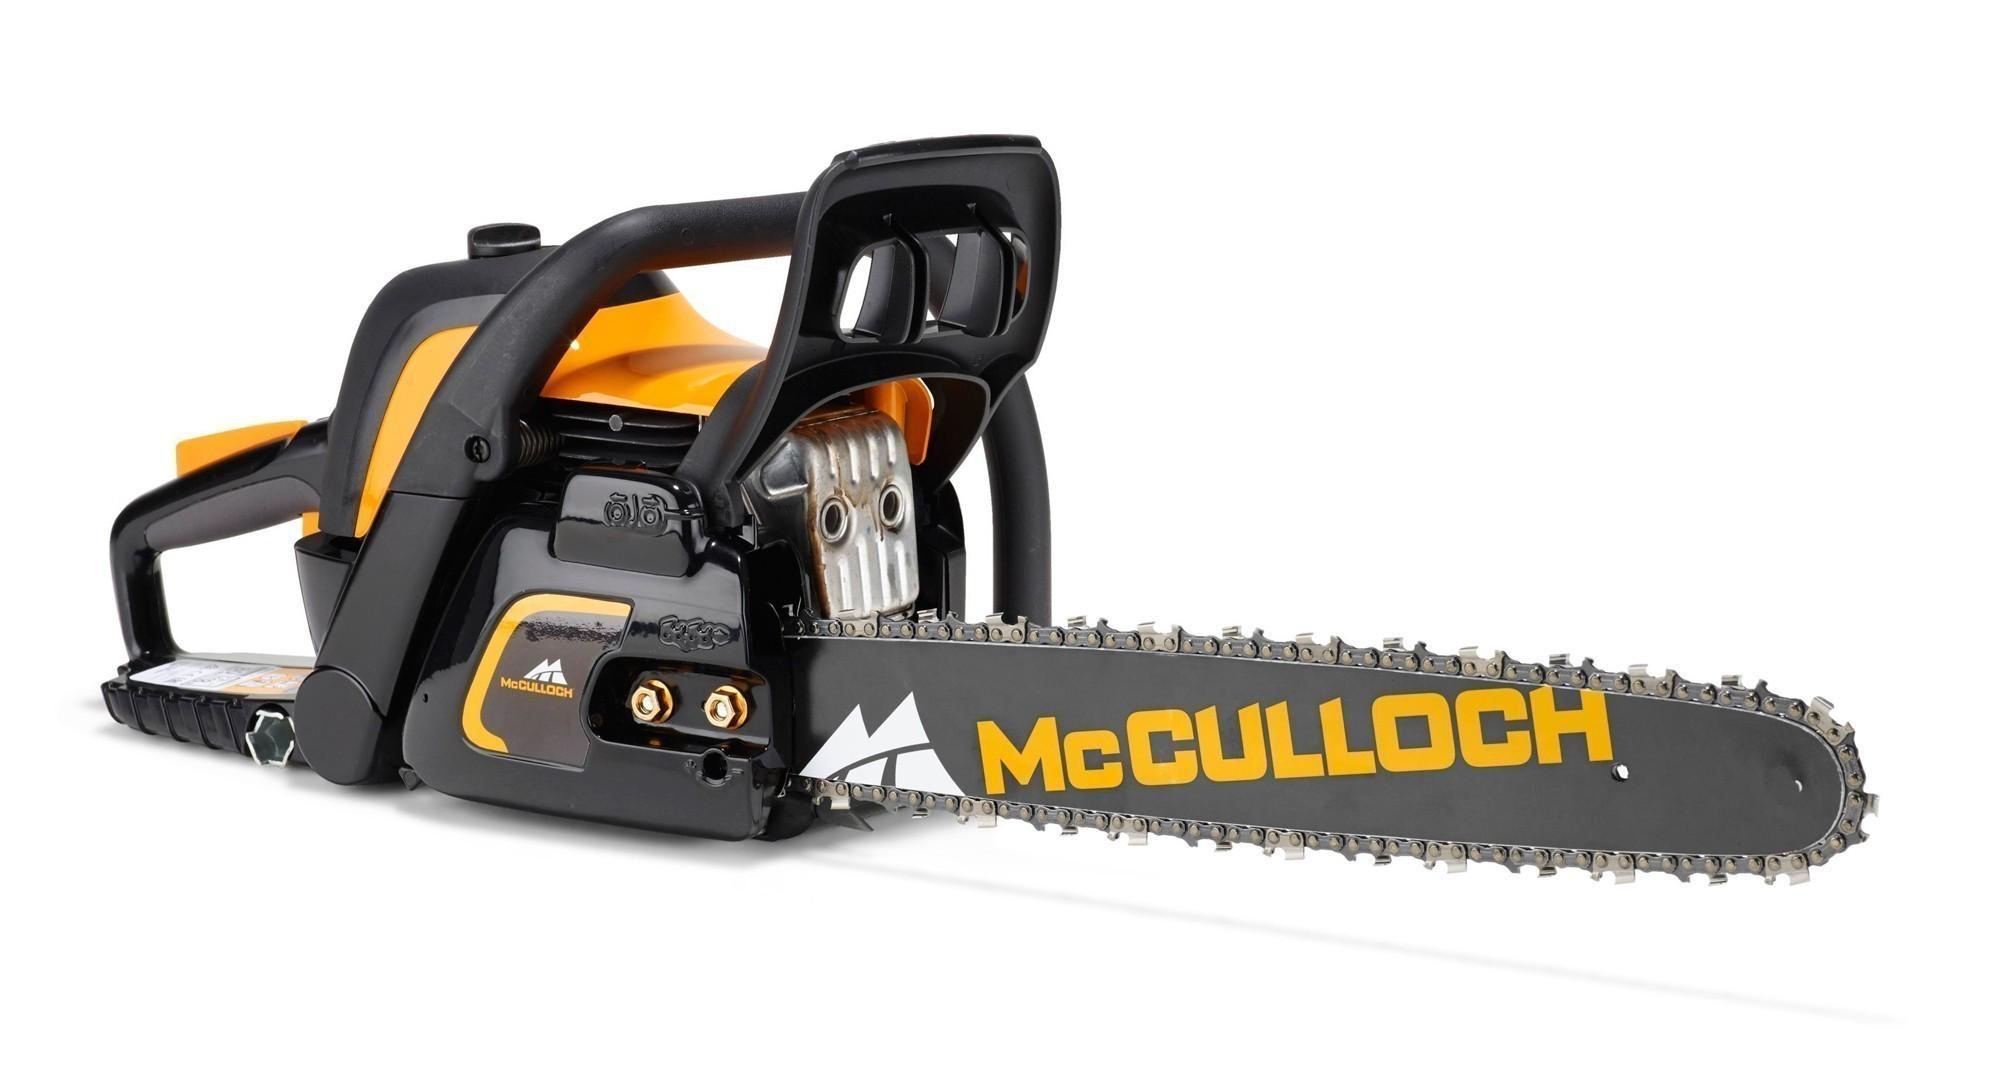 McCulloch Benzin Kettensäge CS50S Schwertlänge 45cm Bild 1